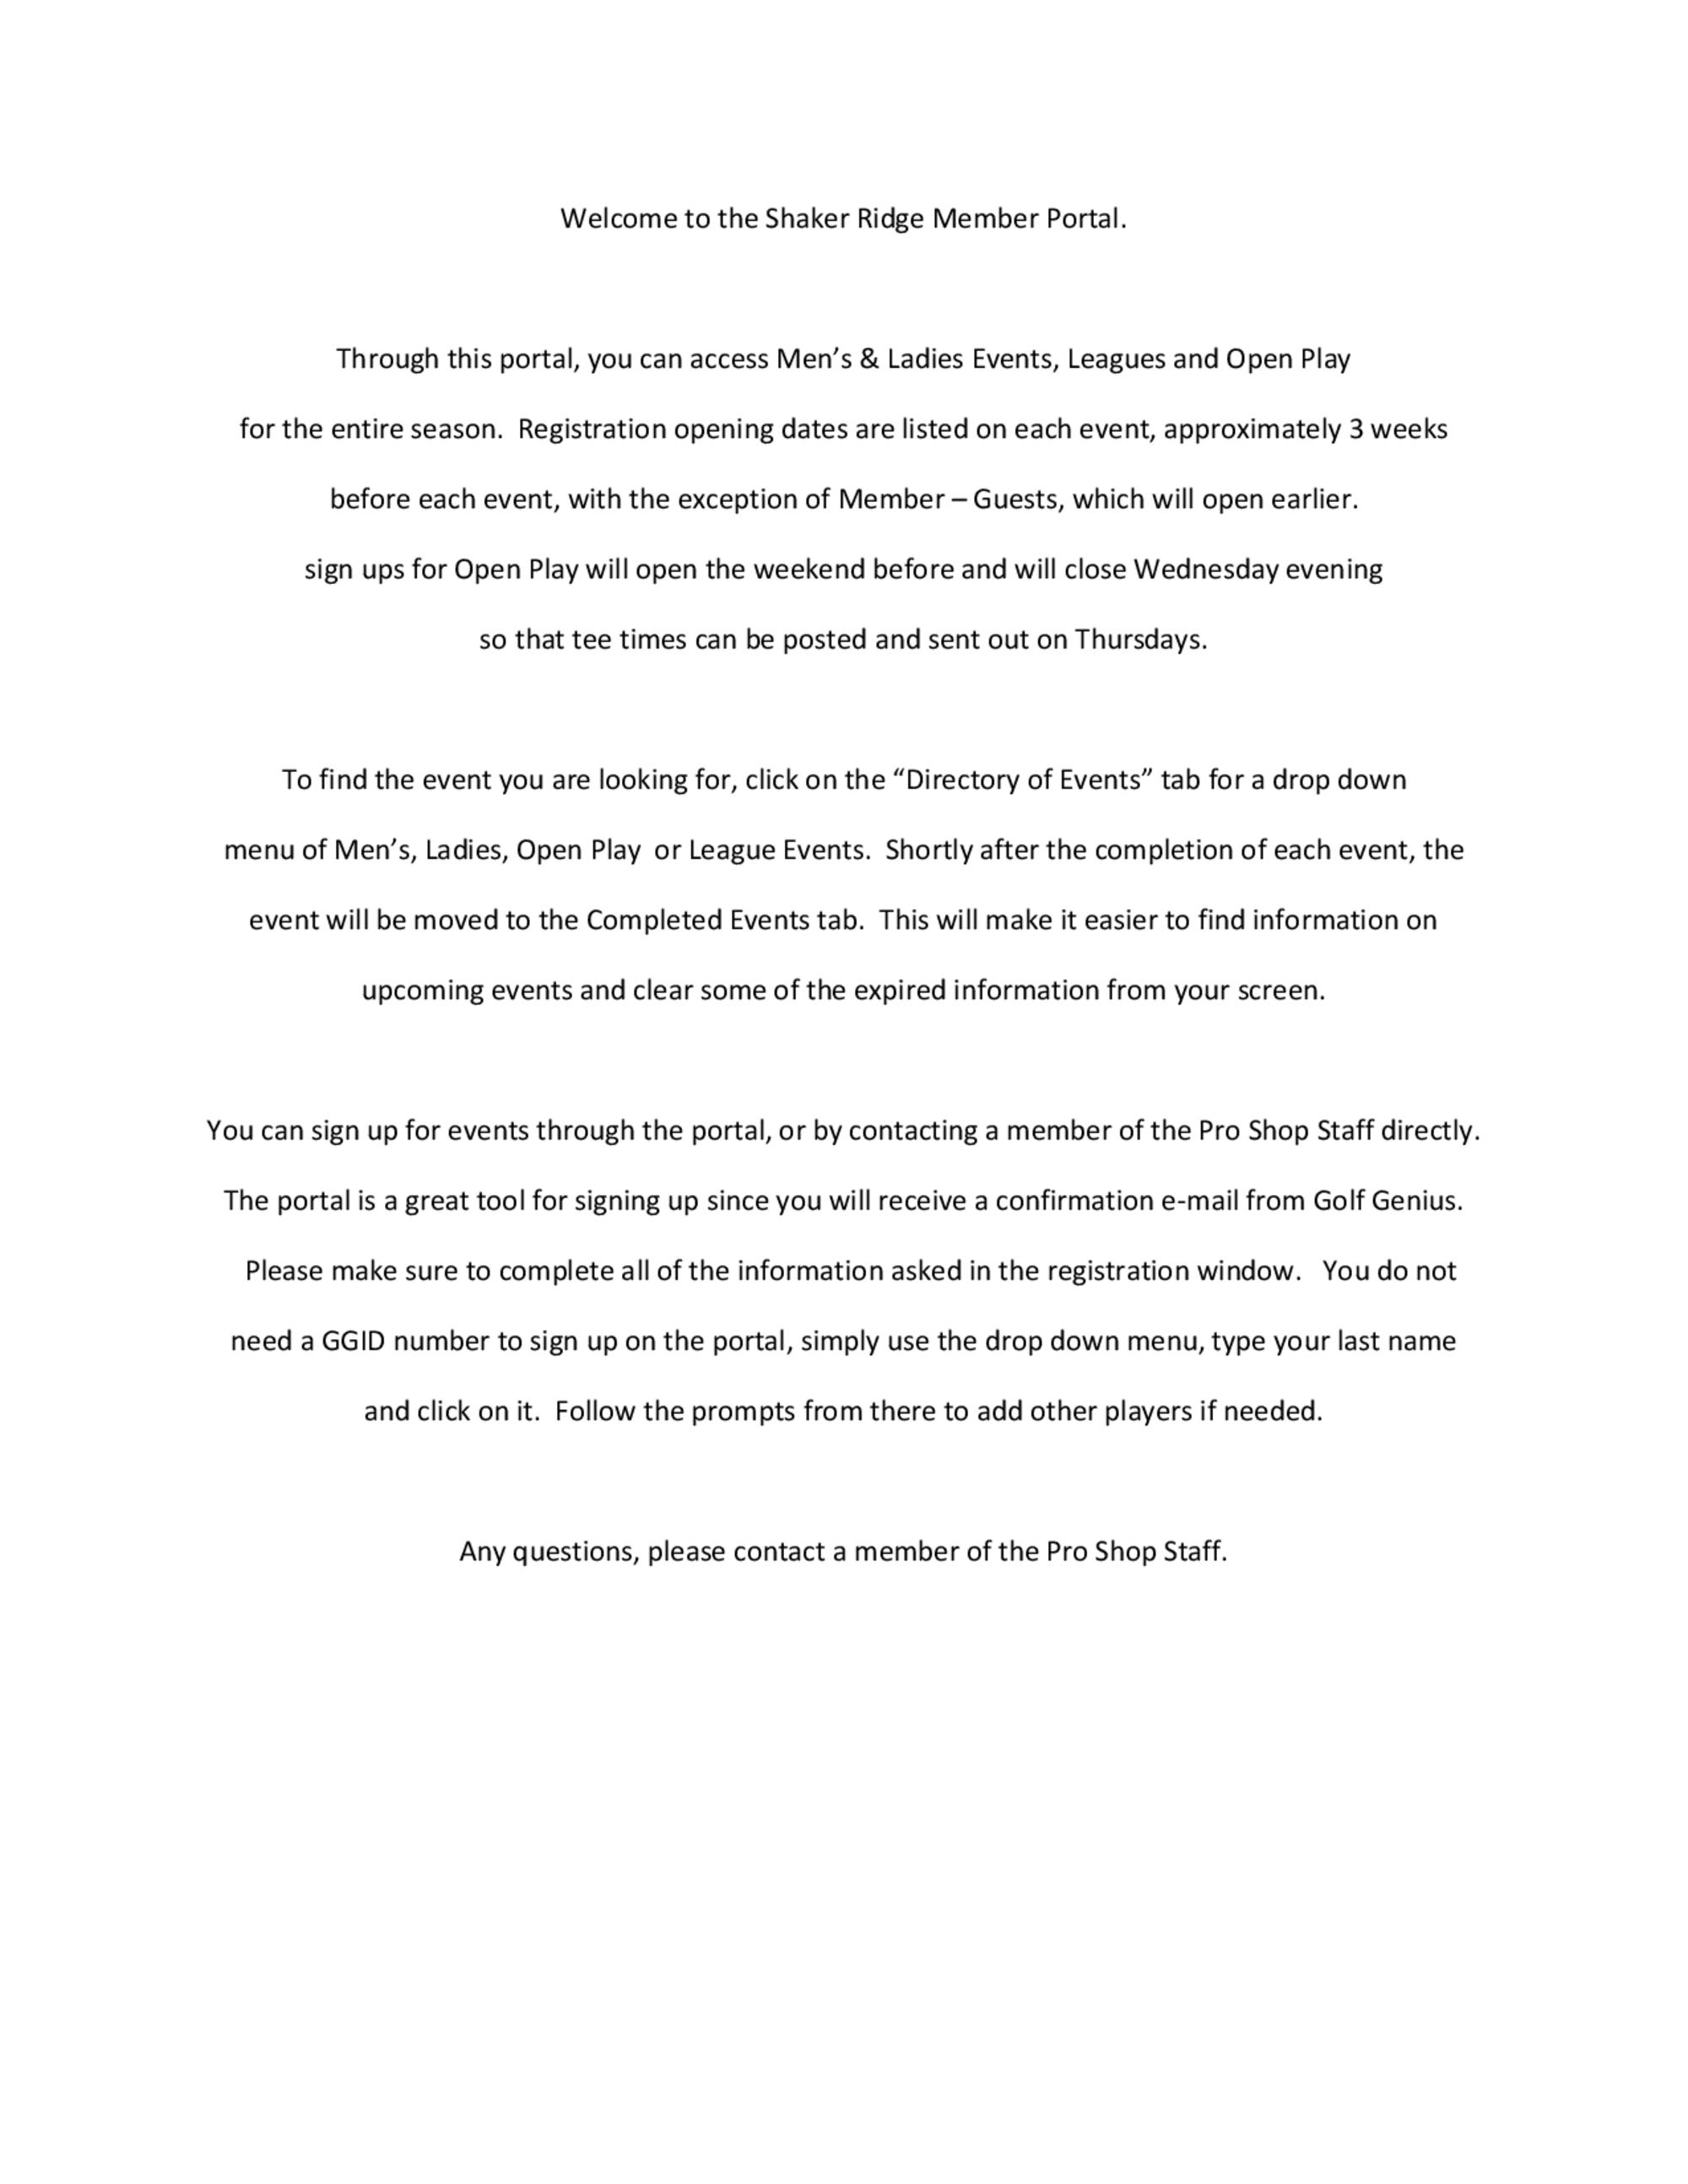 Welcome to the shaker ridge member portal pdf 1